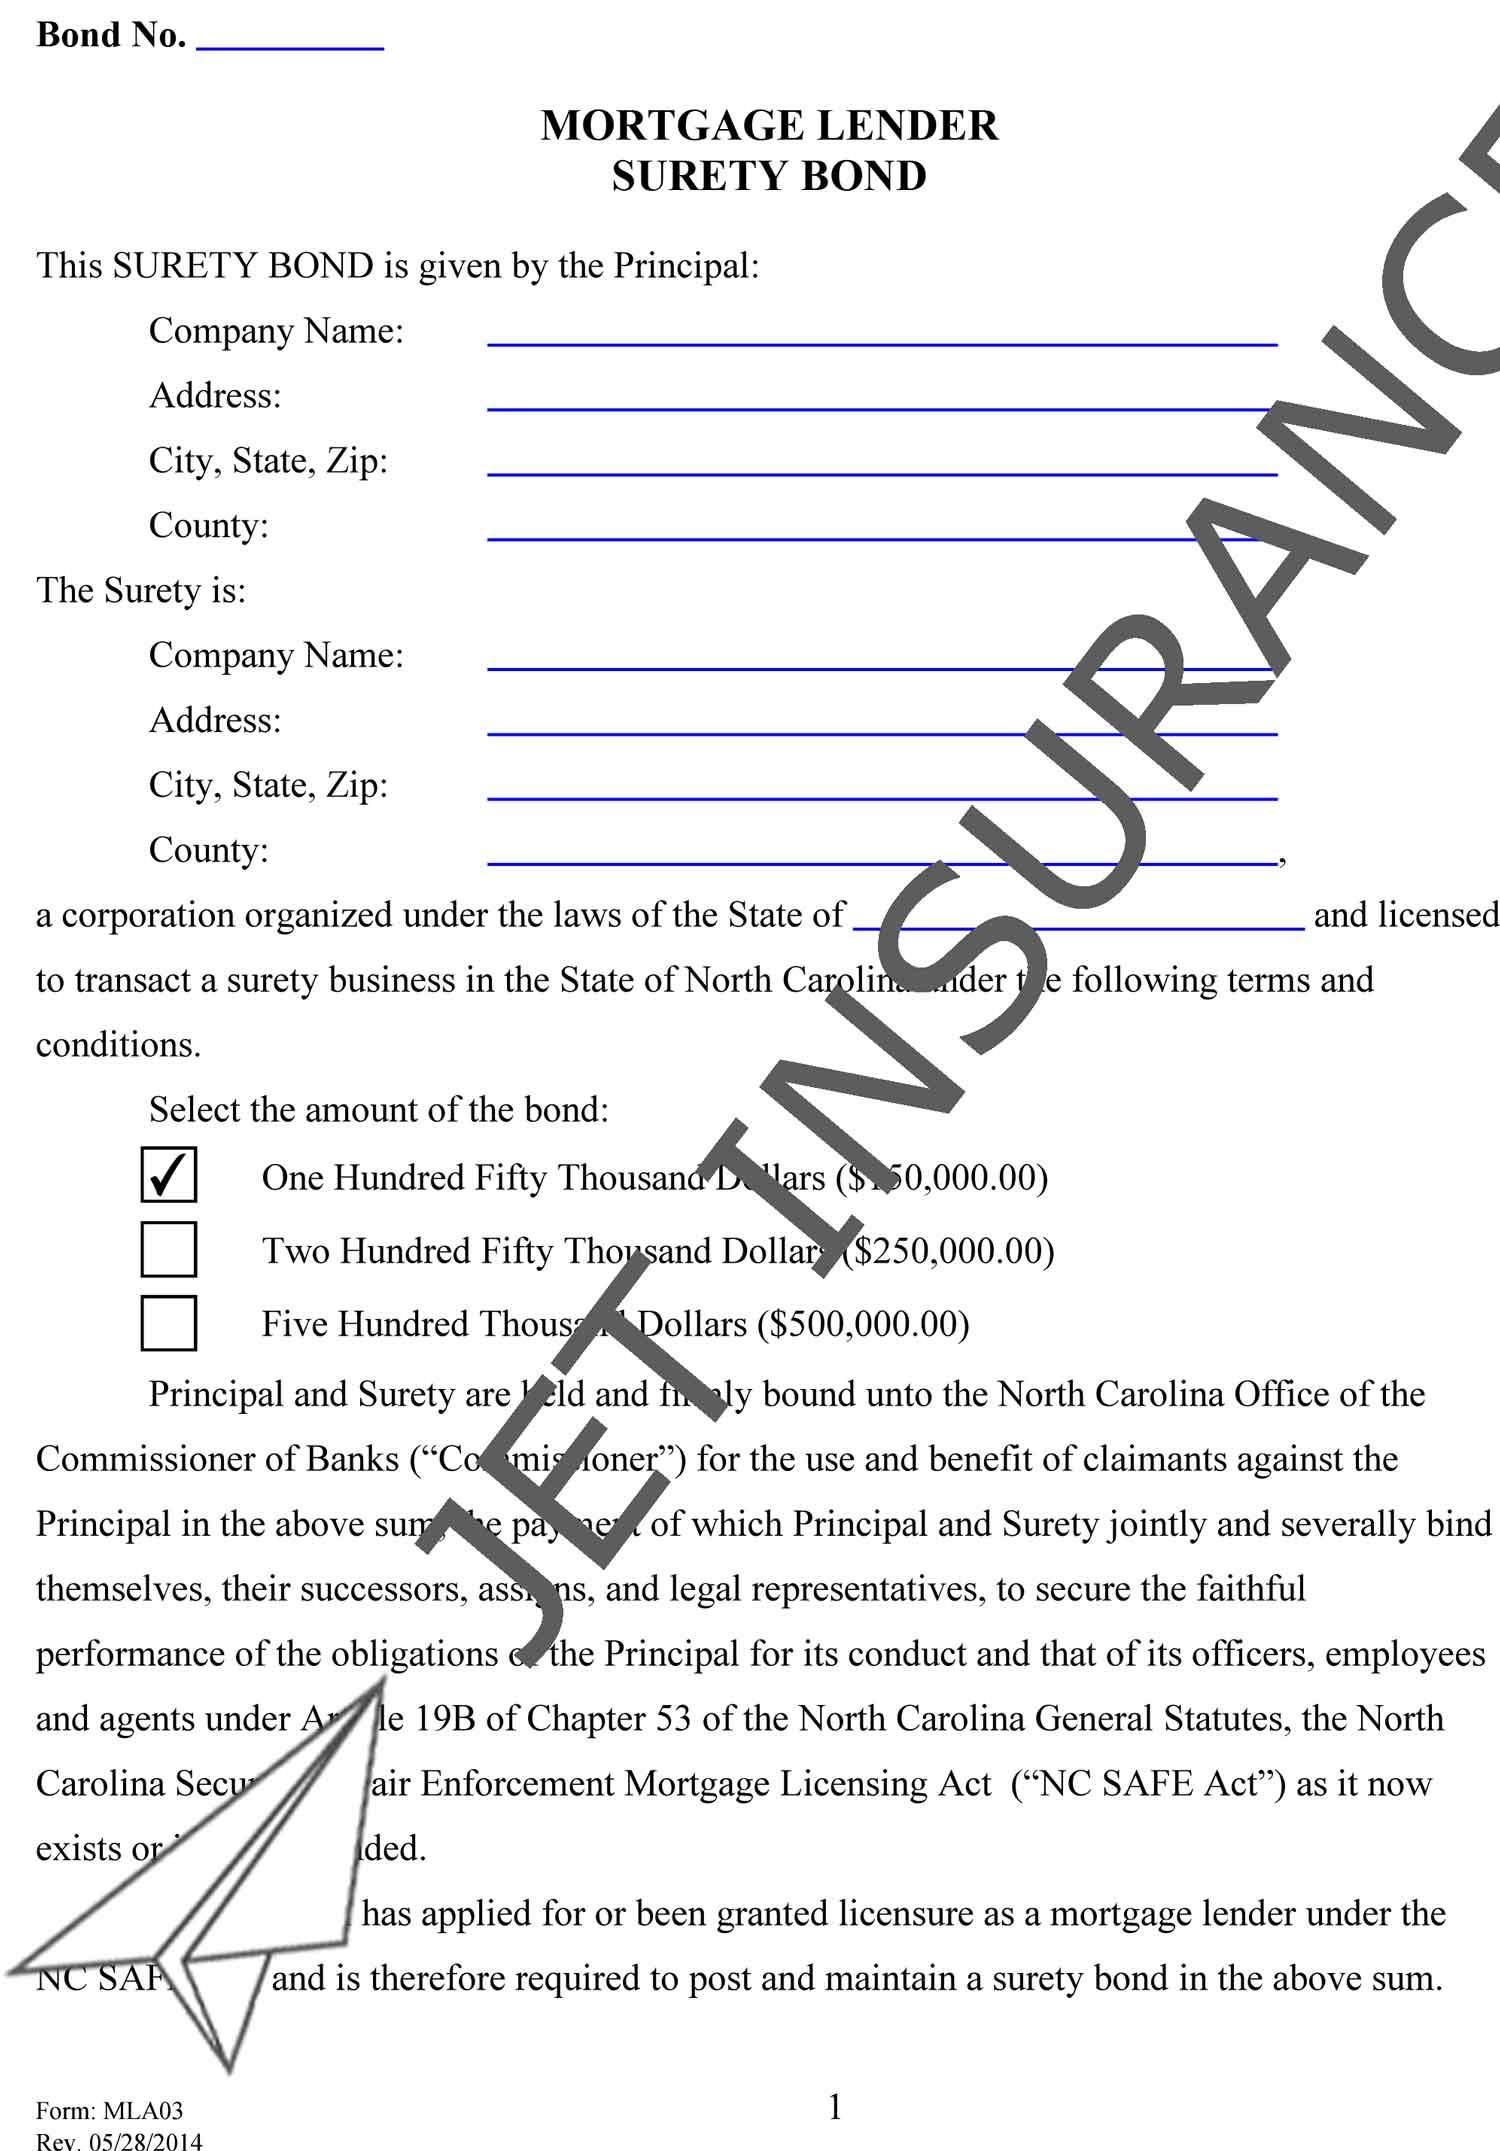 North Carolina Mortgage Lender Bond Form